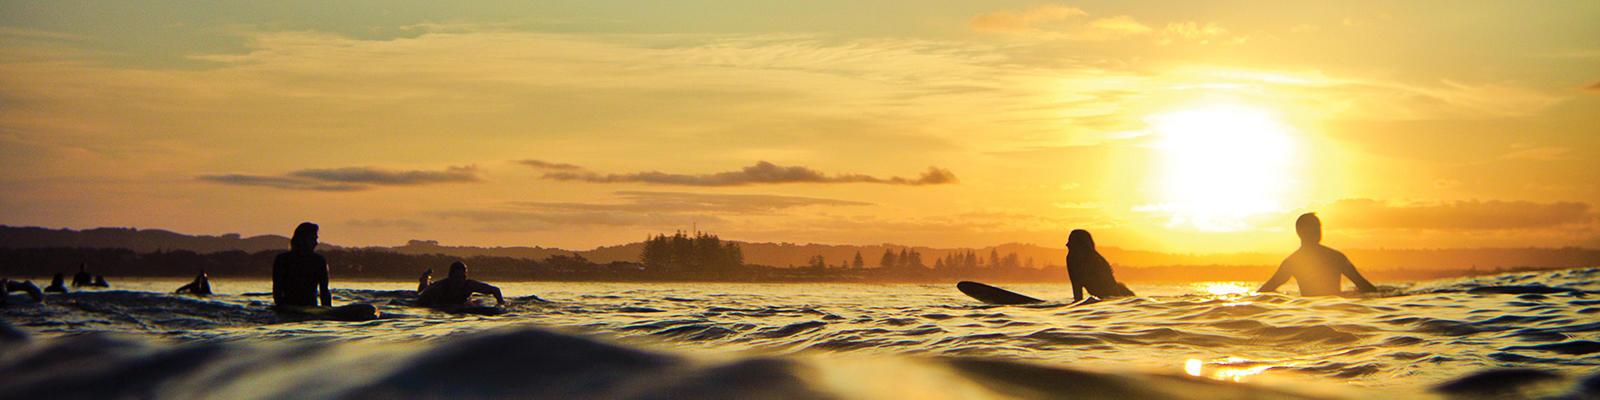 byron bay surfers at sunrise